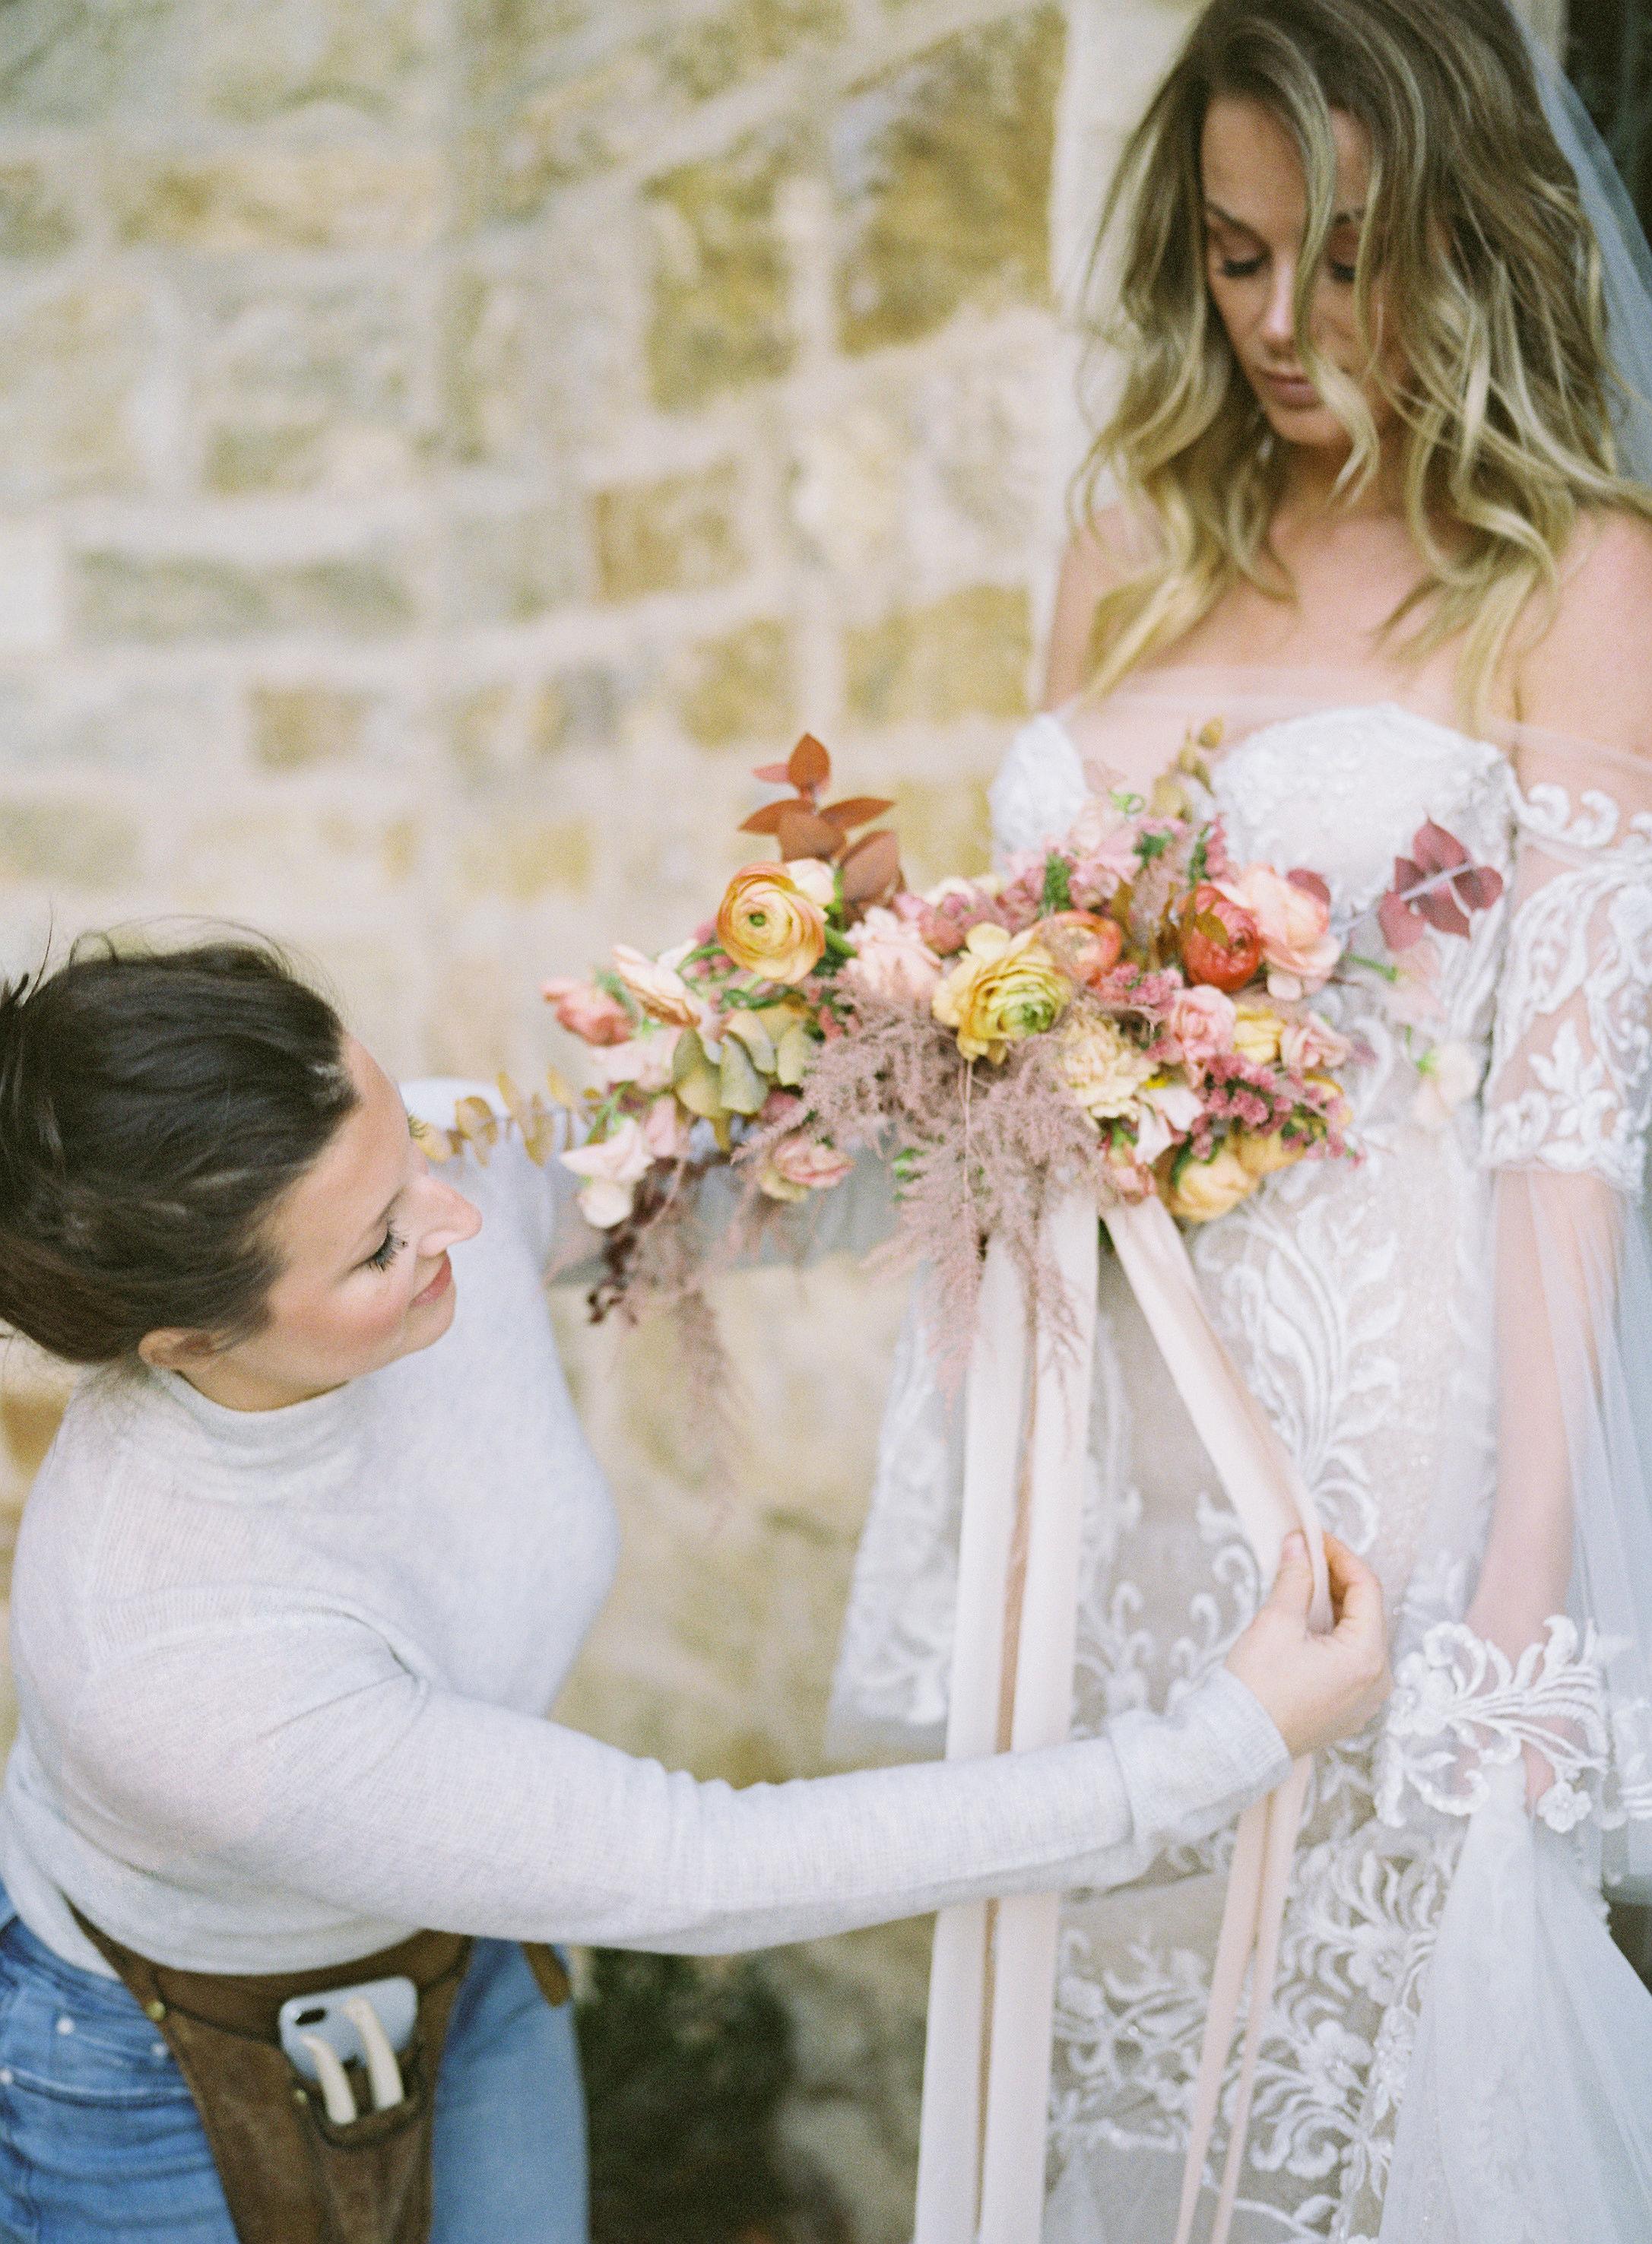 Jessica-Zimmerman-Events-Top-Wedding-Planner-Educator.JPG